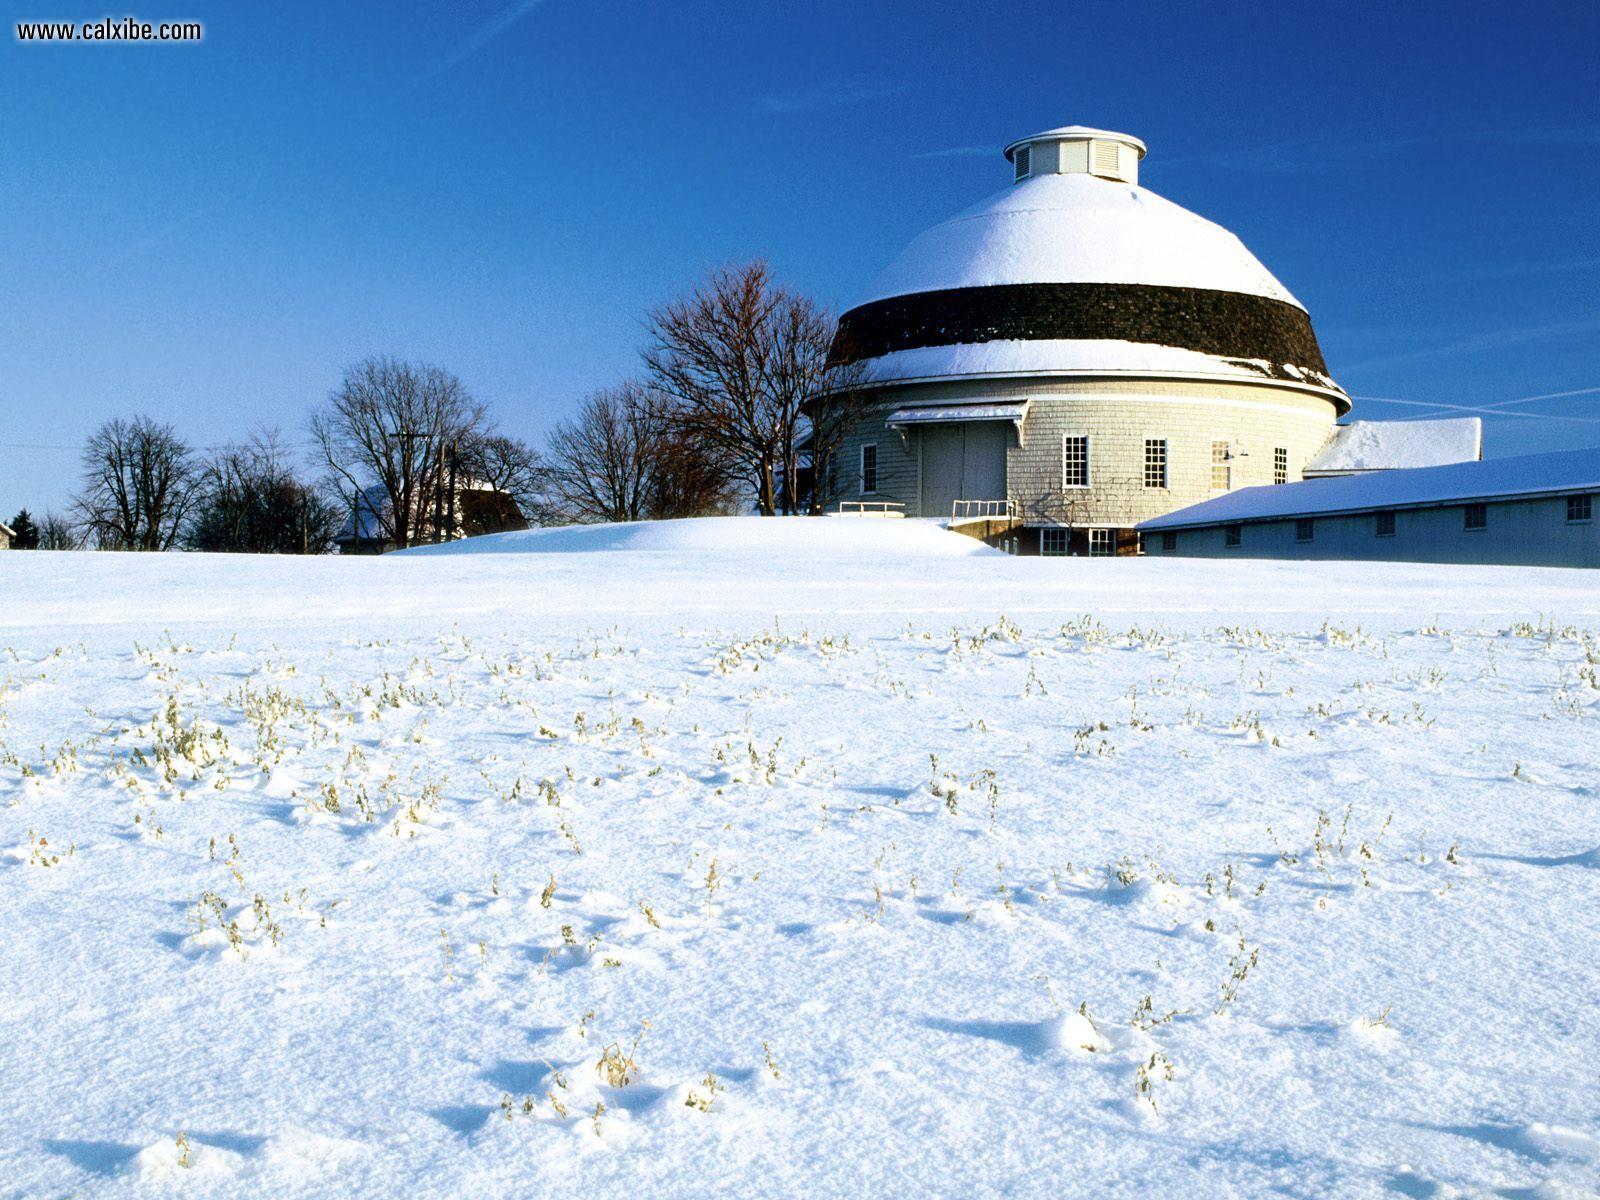 Winter Dome University of Illinois desktop wallpaper nr 4357 1600x1200